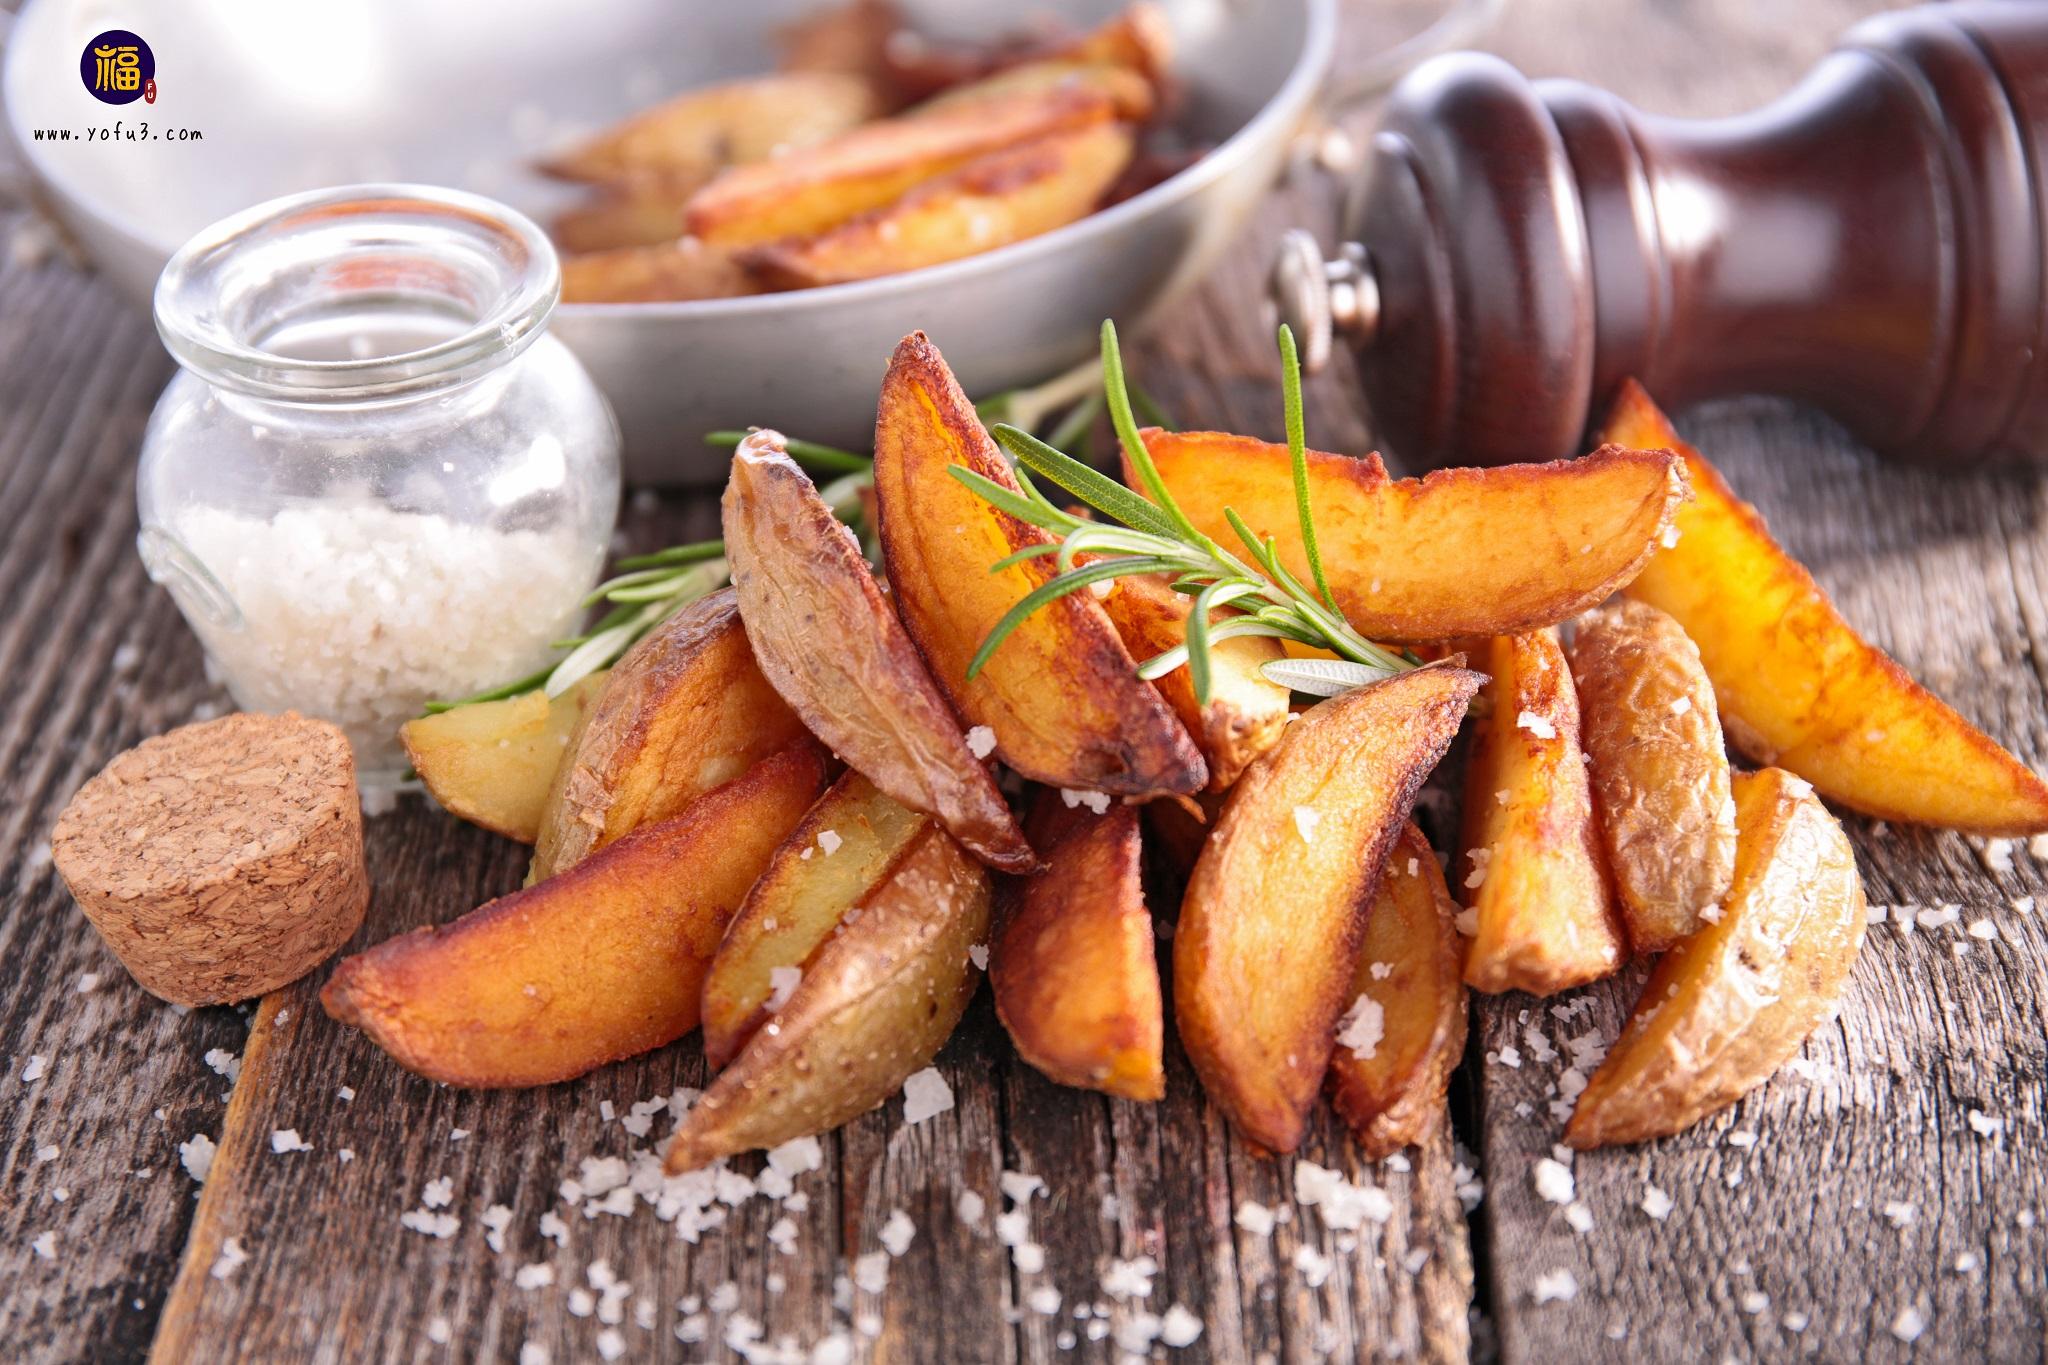 特選楔形薯條 (Selected Potato Wedges)